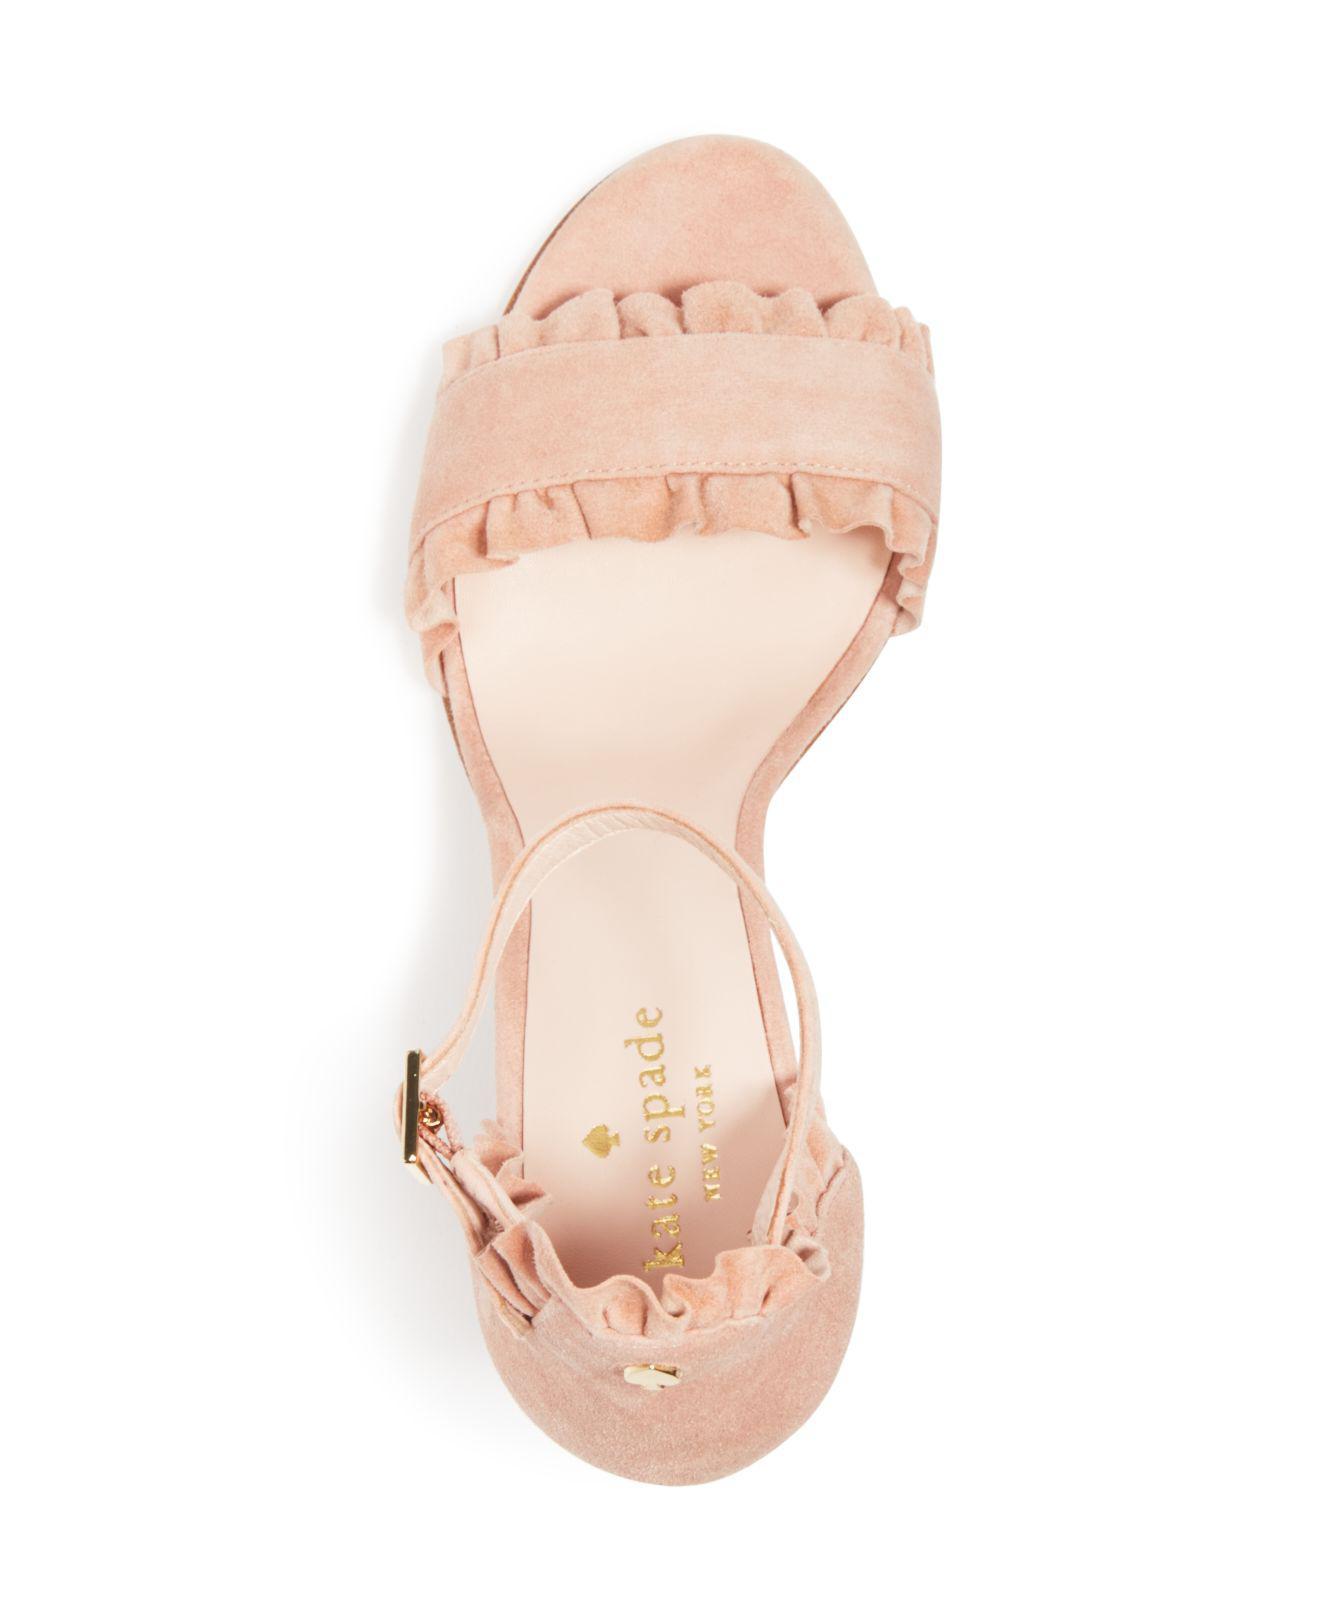 1c31dc4798c Lyst - Kate Spade Women s Odele Suede High-heel Sandals in Pink